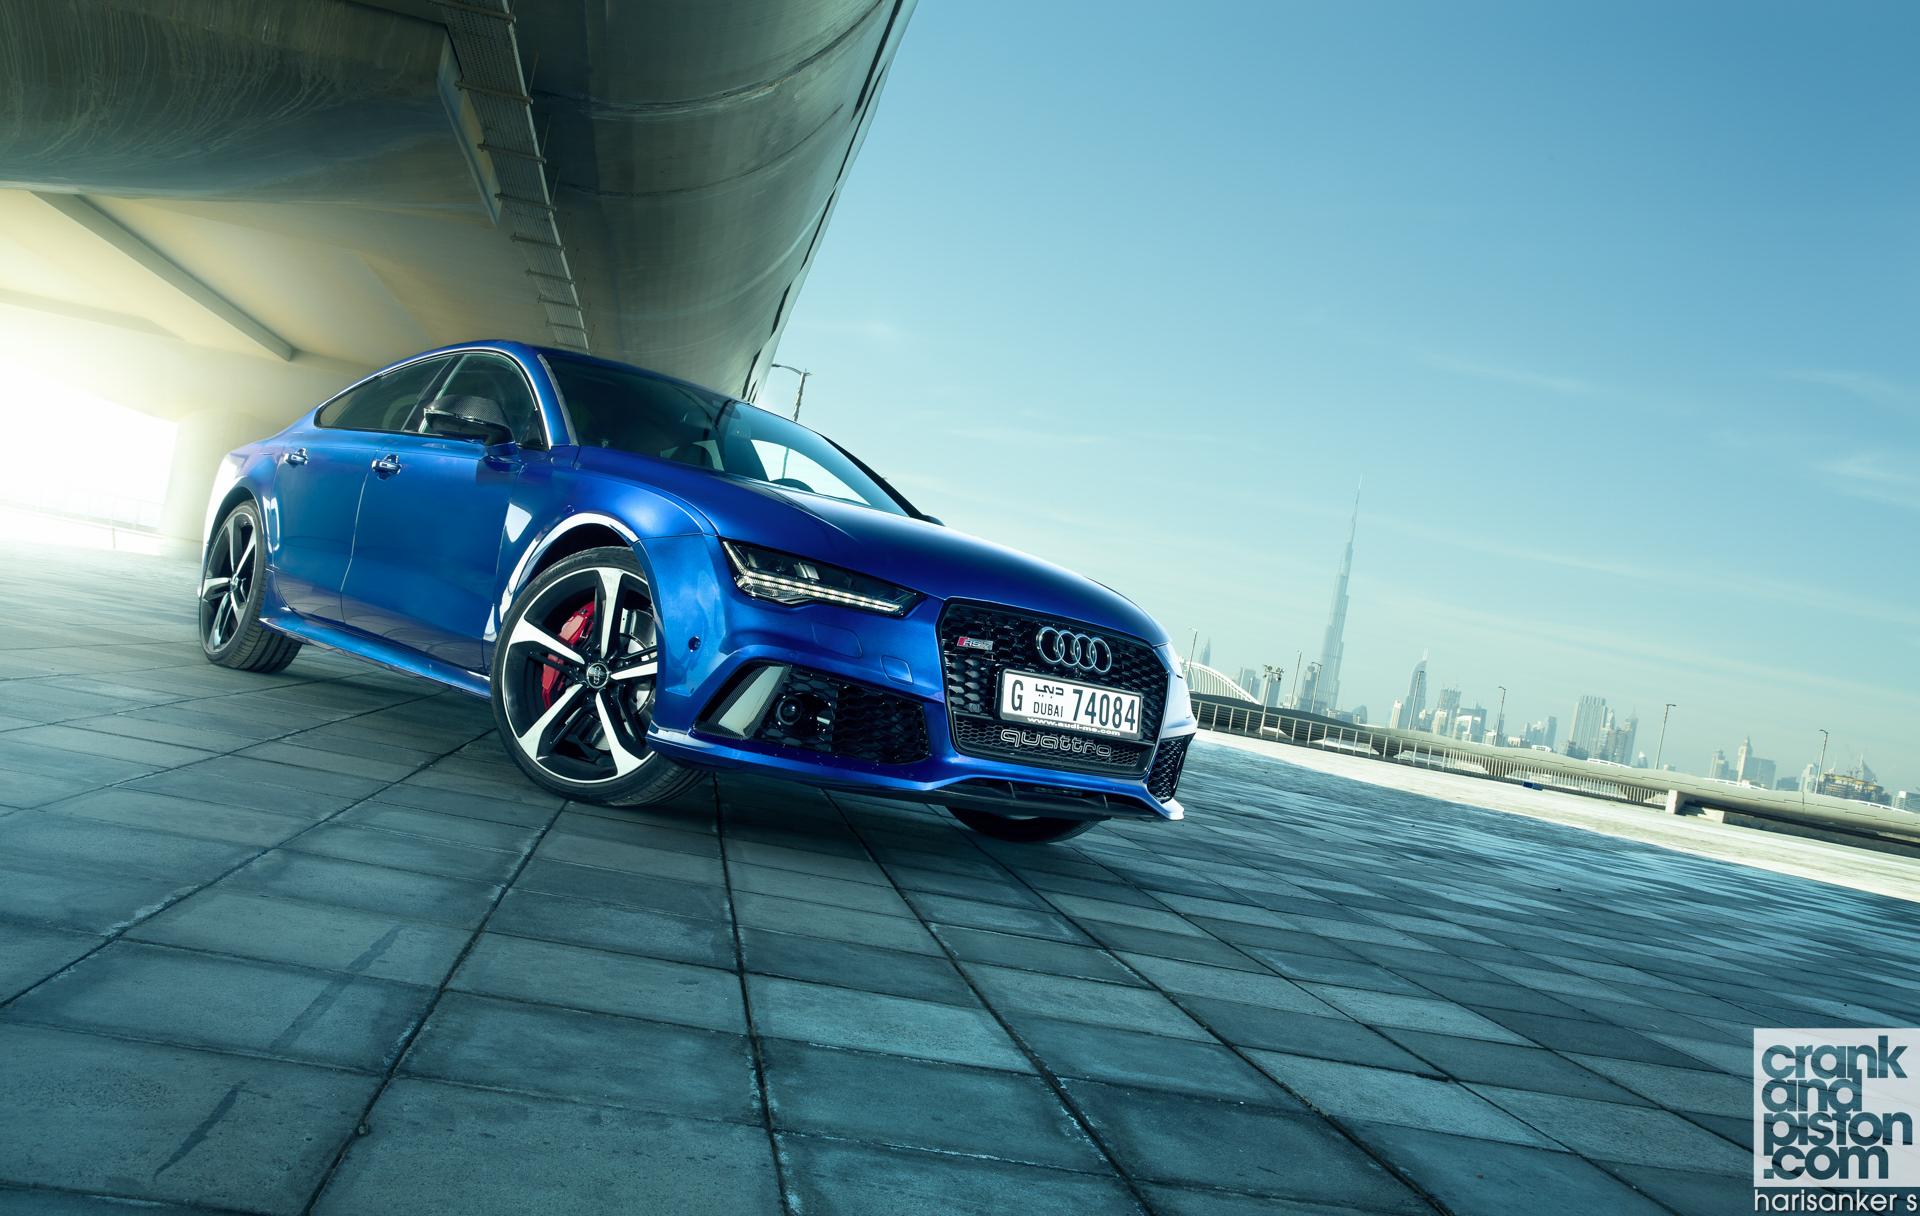 Audi RS7 crankandpiston Wallpapers-3